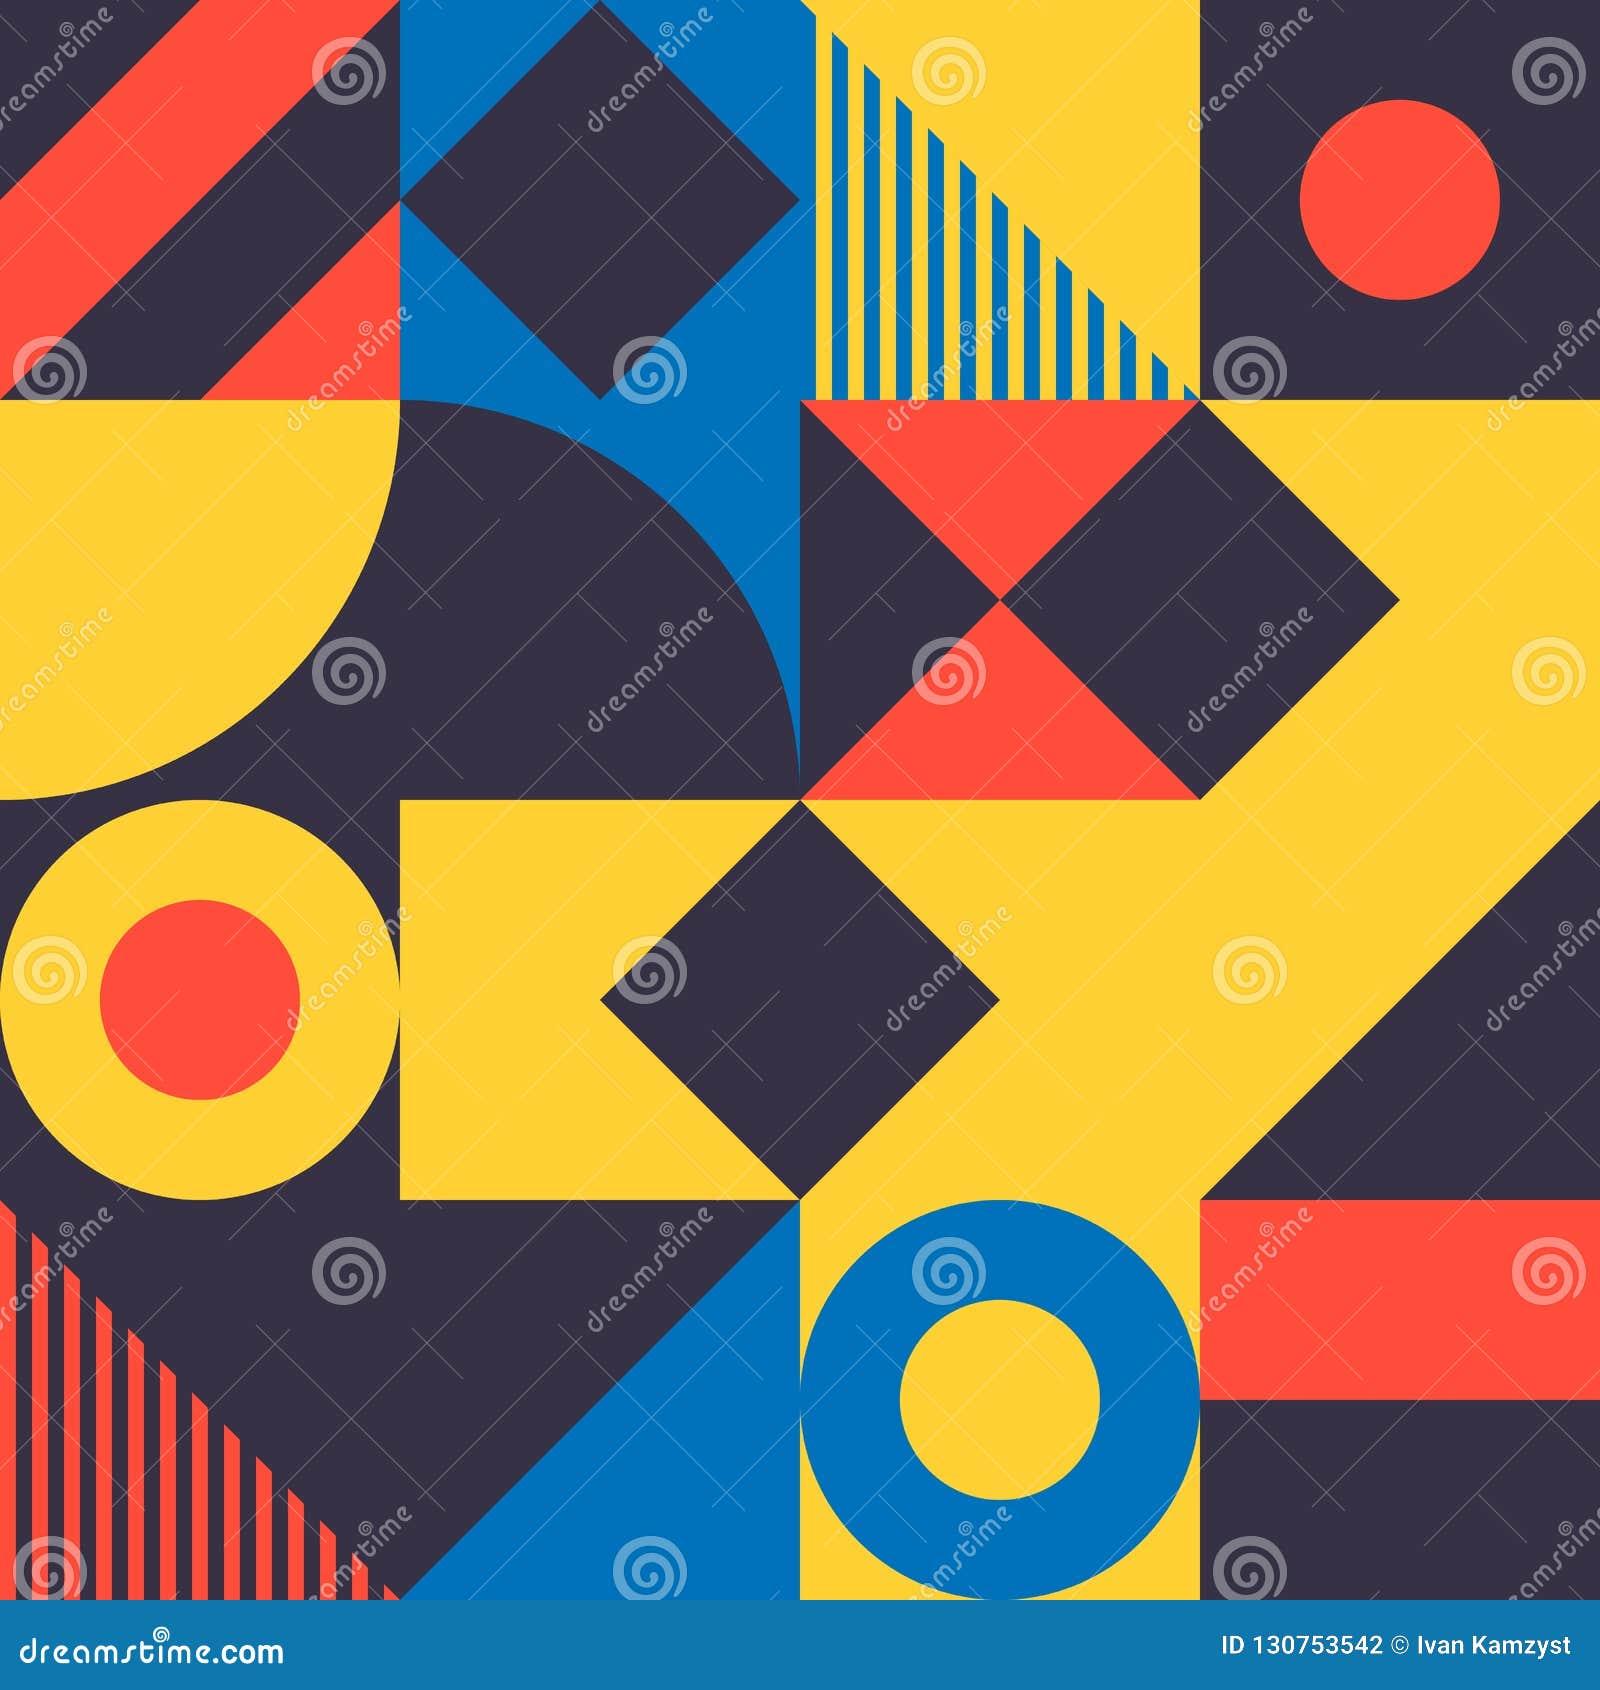 simple-geometric-artwork-editable-bold-blocks-scandinavian-style-universal-abstract-seamless-pattern-wallpaper-web-130753542 Get Inspired For Simple Vector Artwork @koolgadgetz.com.info